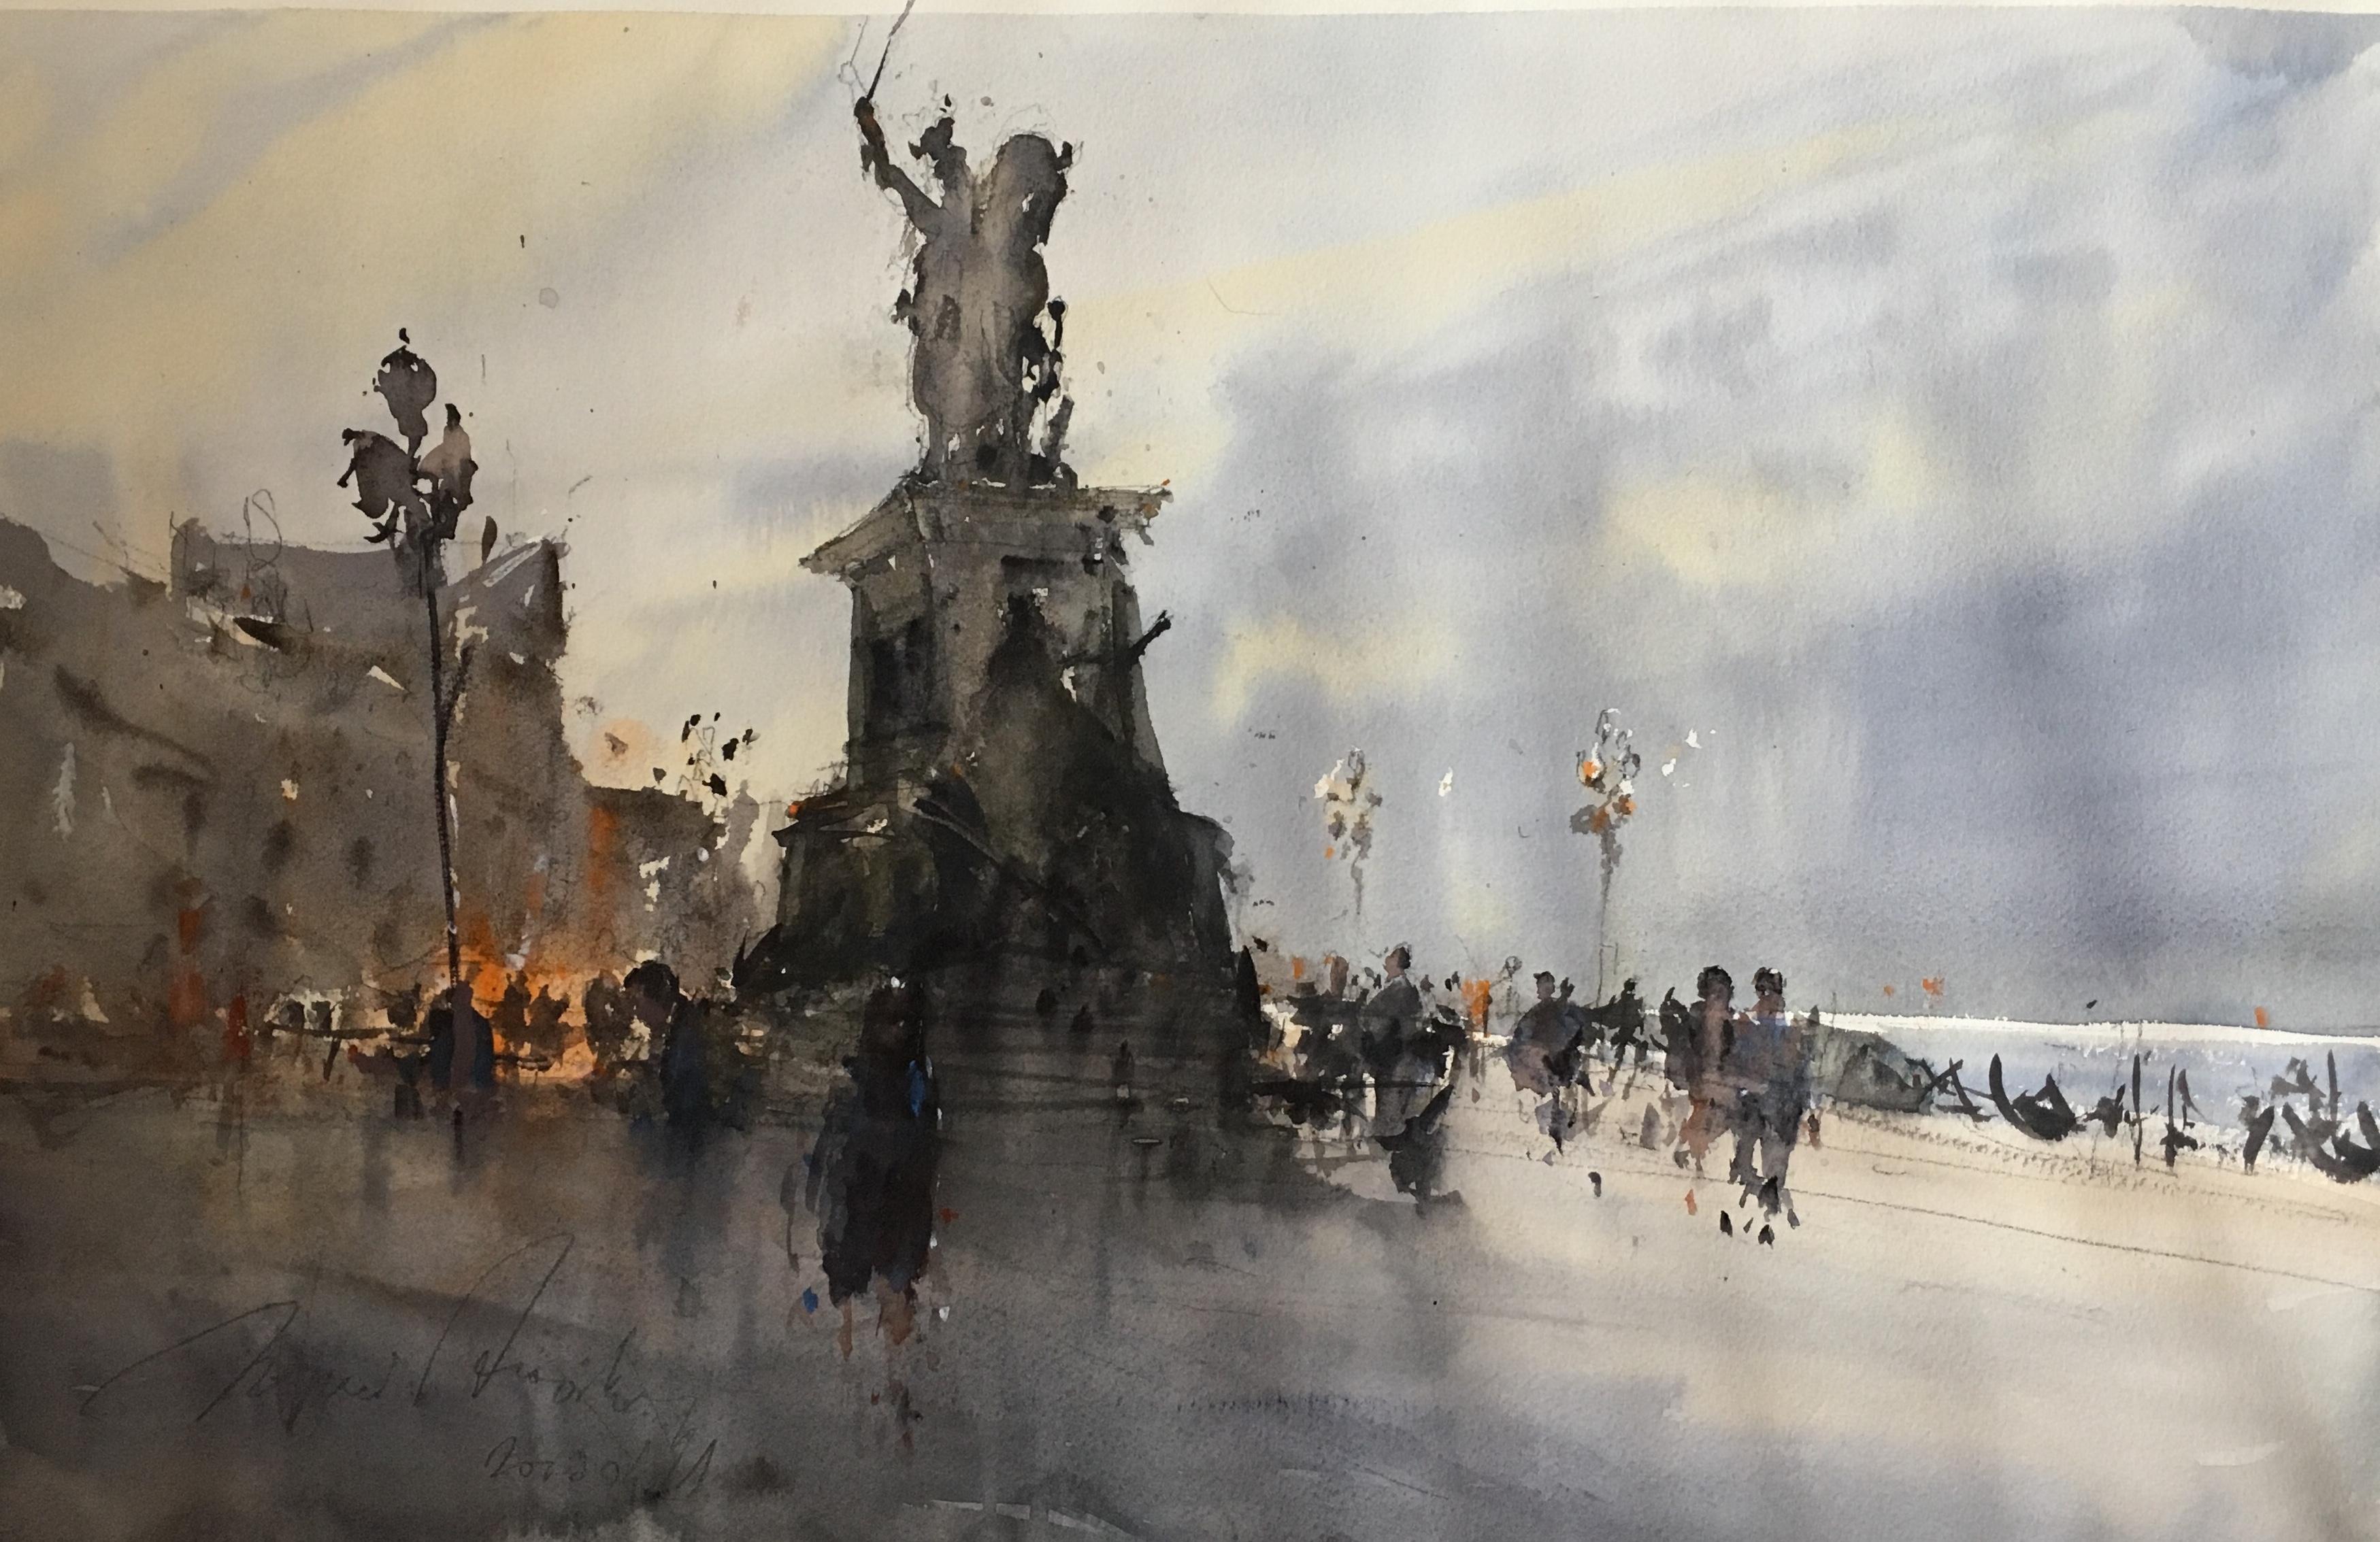 Виктору Эммануилу II, Венеция/ To V